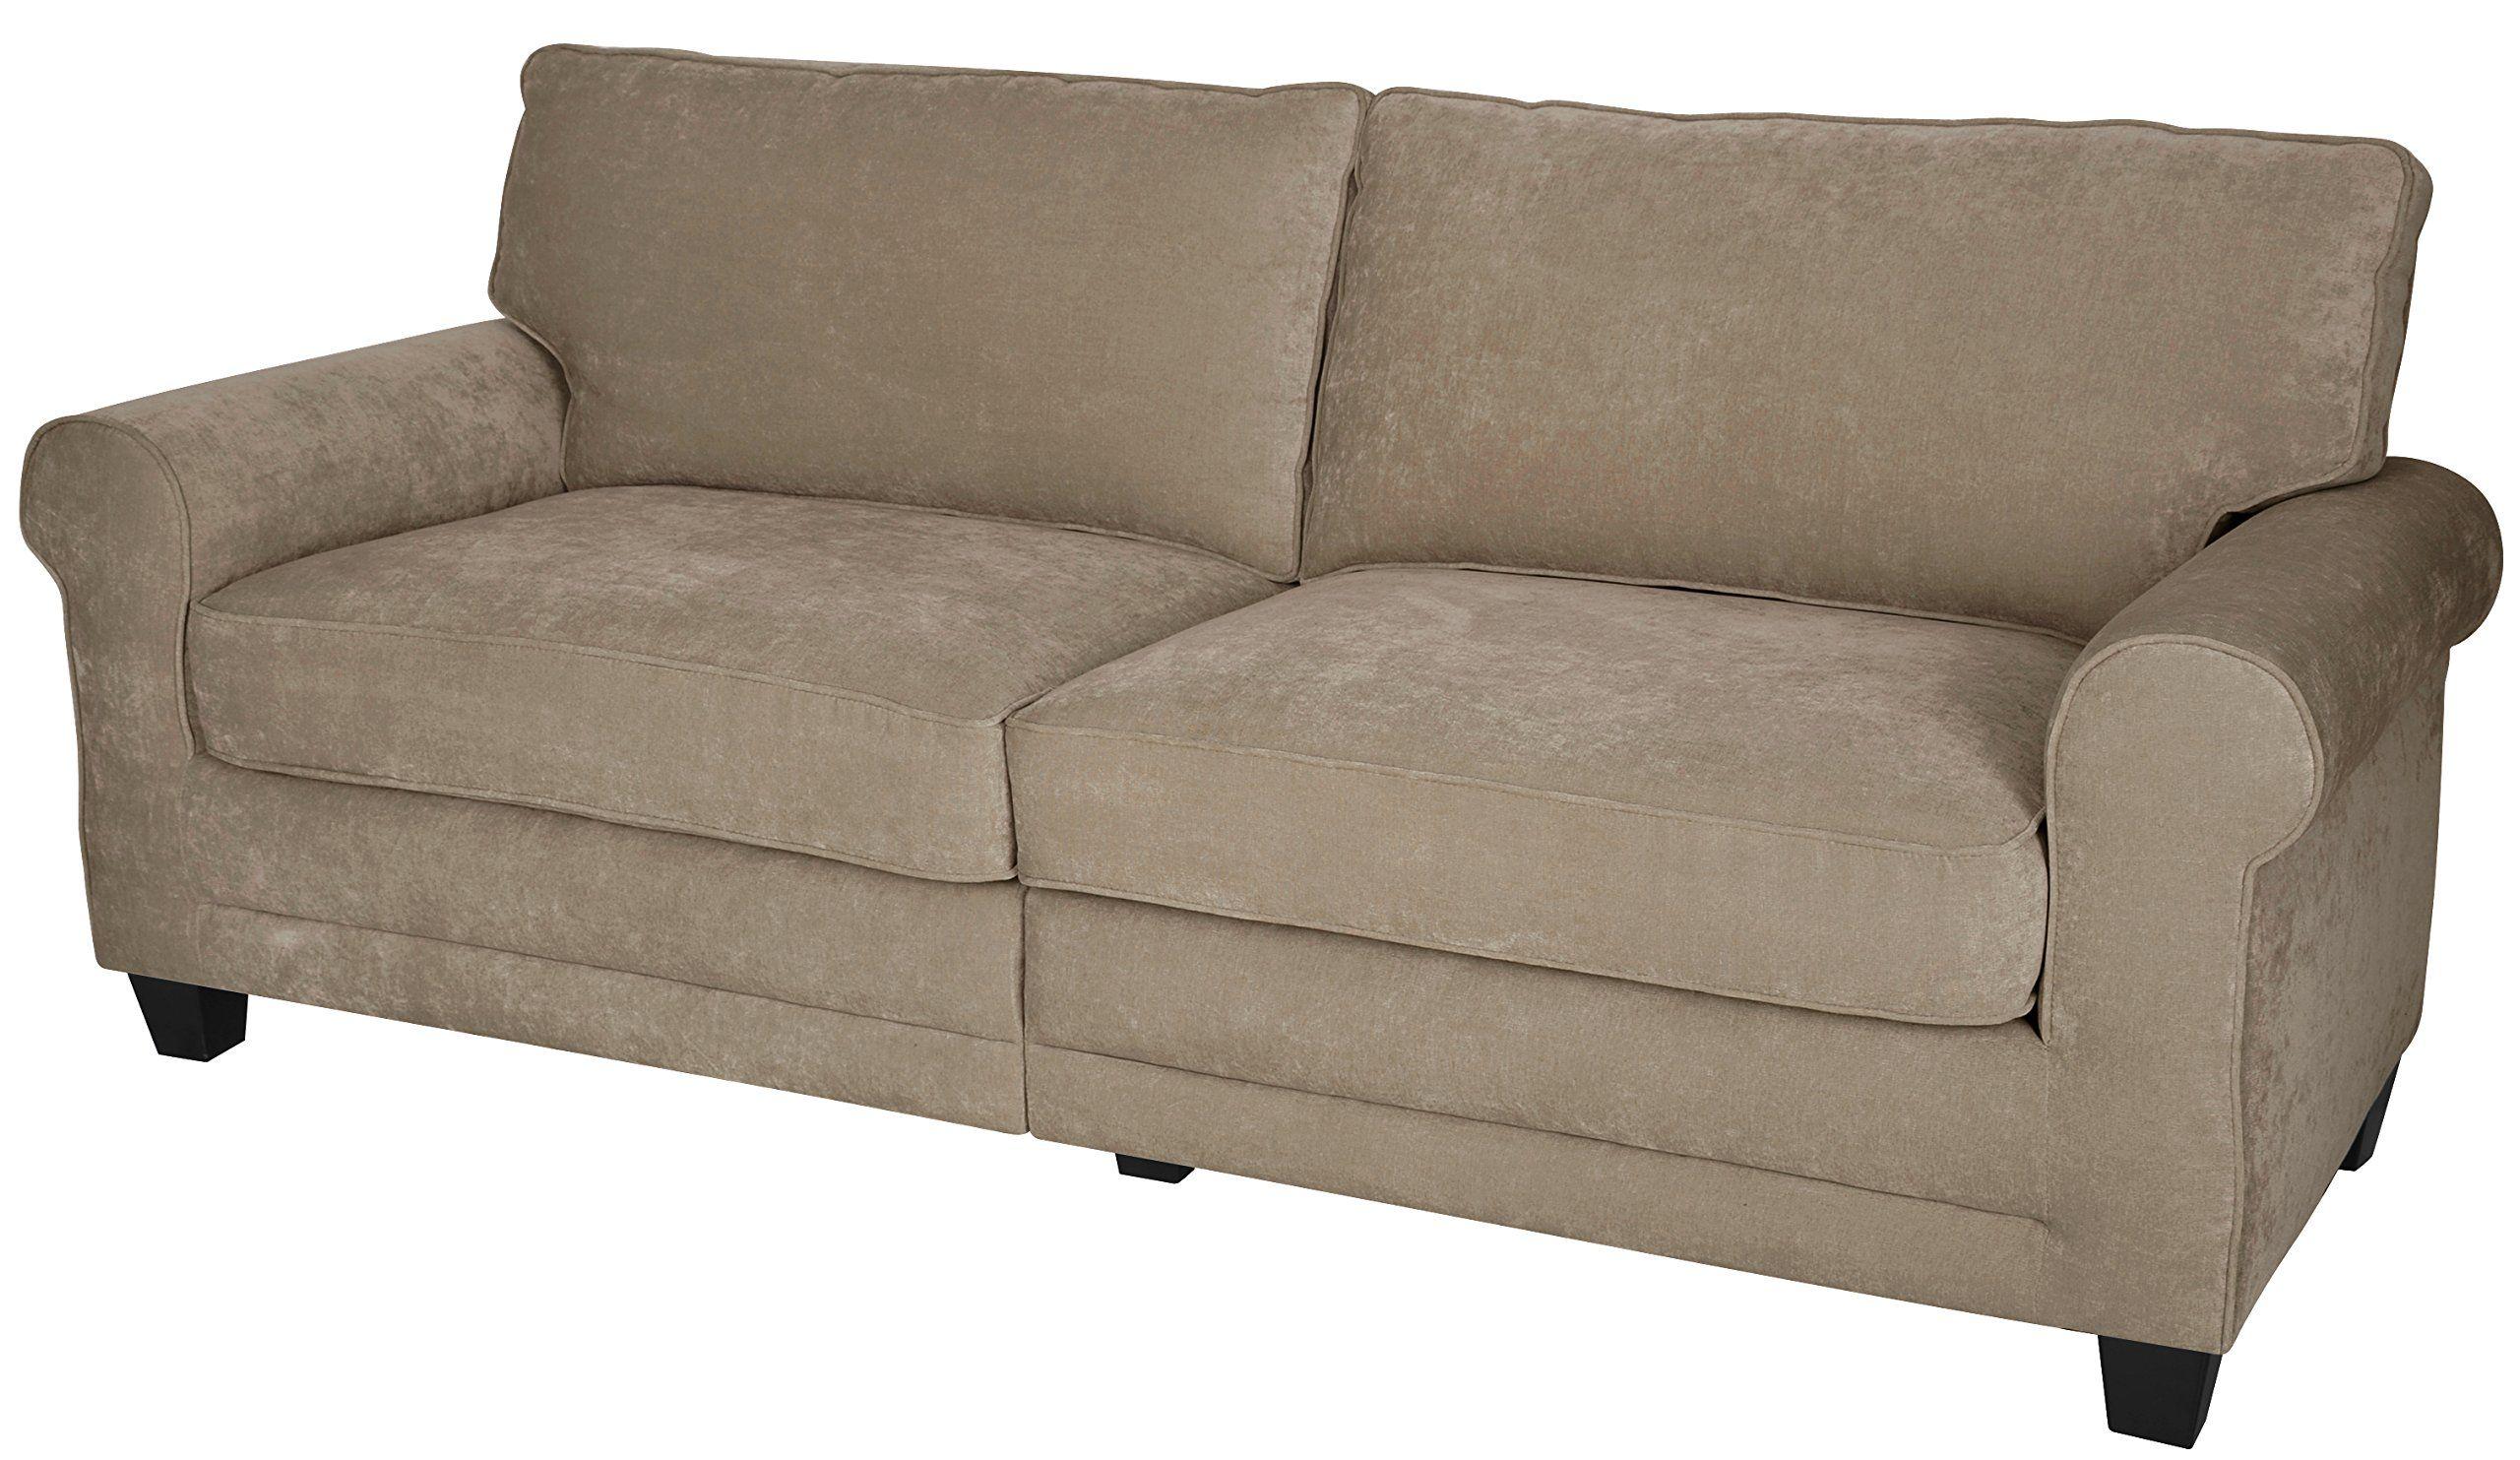 Serta Rta Copenhagen Collection 78 Sofa In Marzipan Check Out